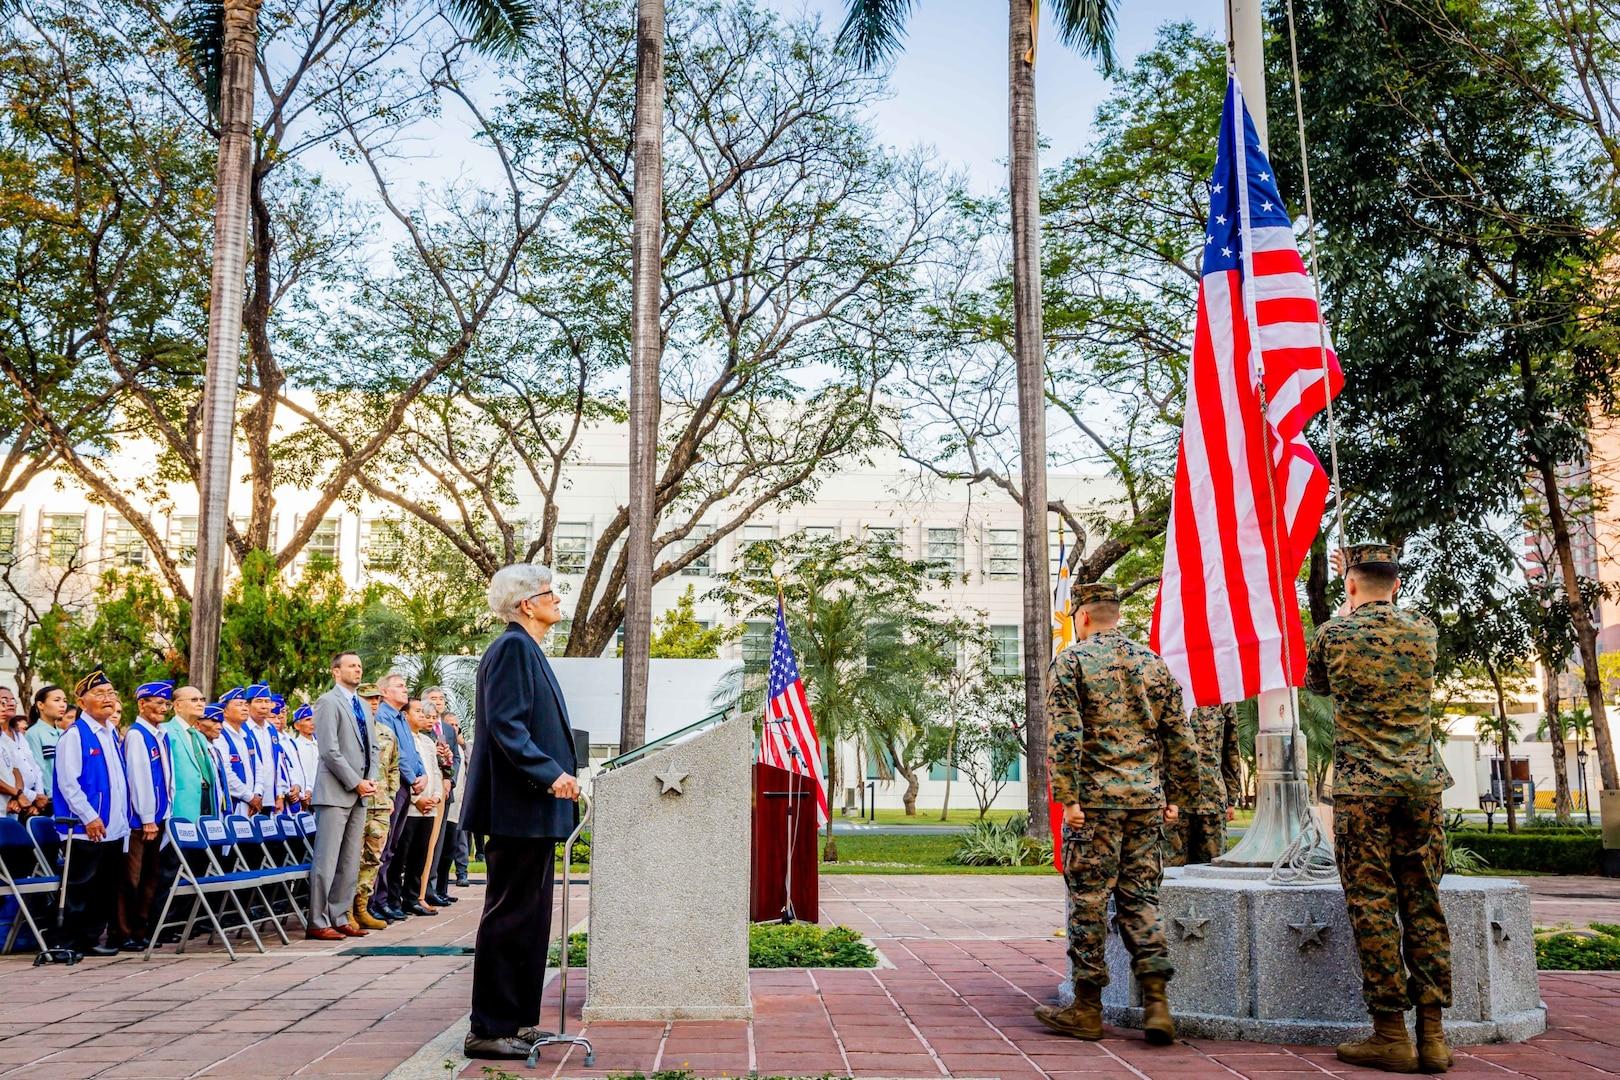 U.S. Embassy Commemorates 75th Anniversary of U.S. Flag Raising after Battle of Manila